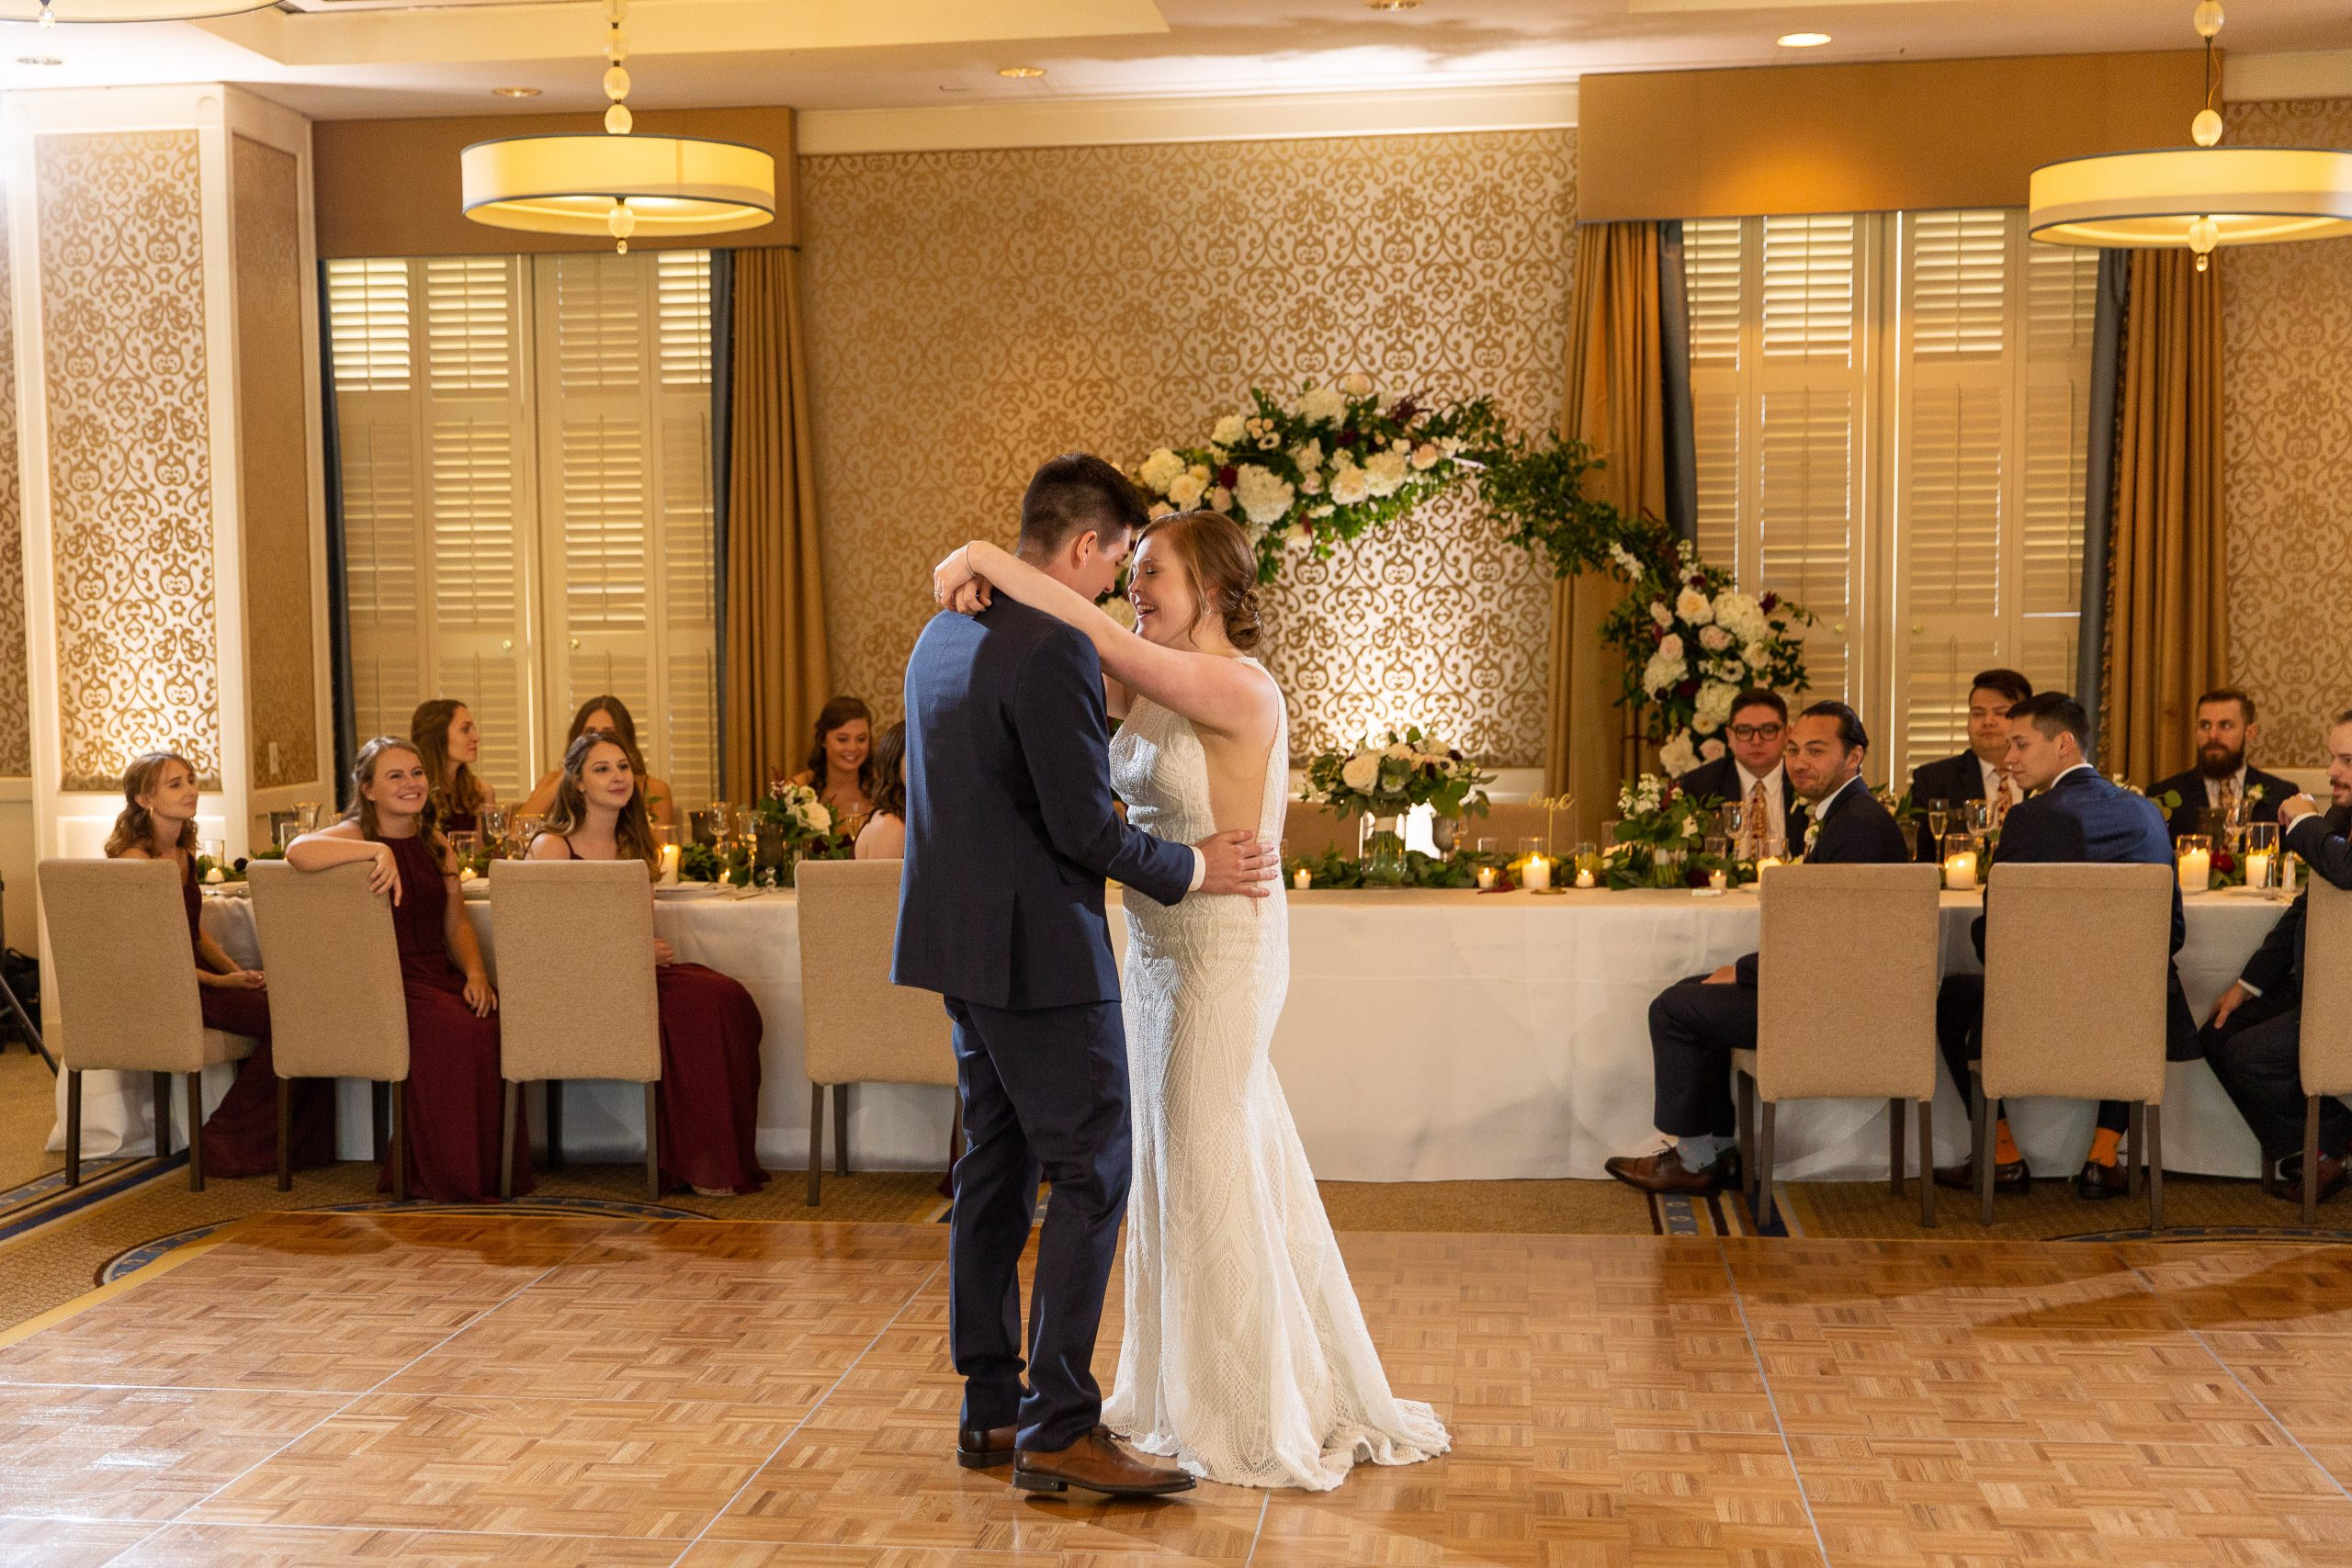 Kiley Wedding - DCM Photo - First Dance